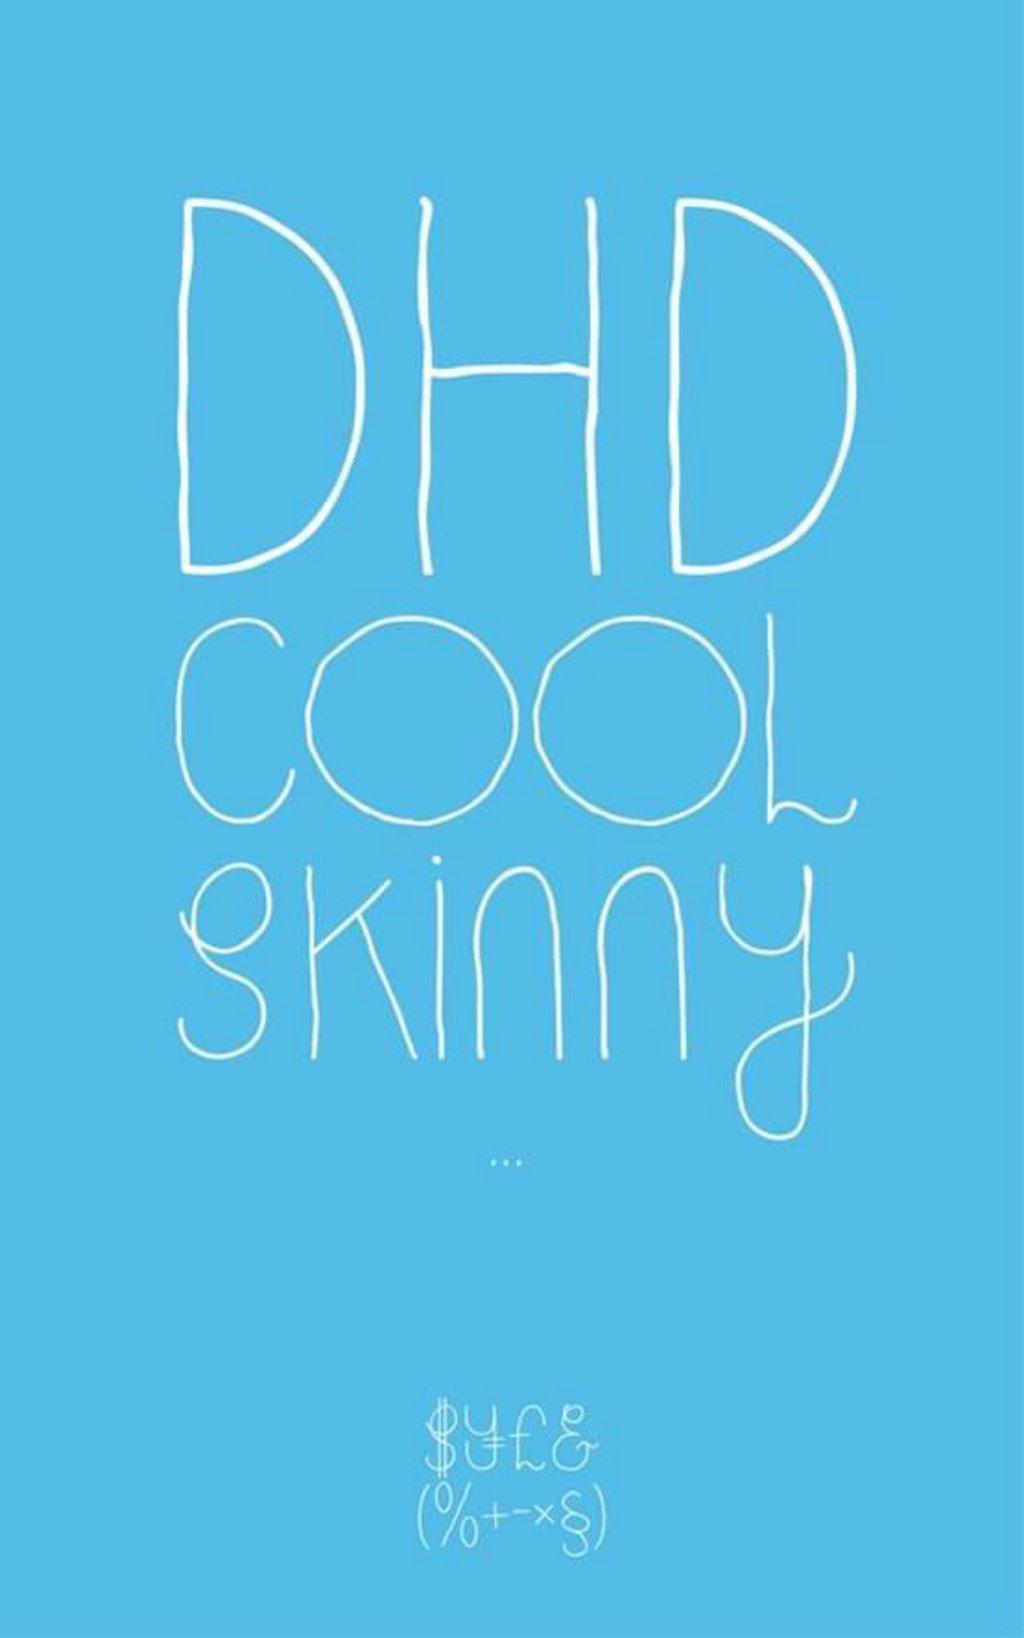 dhd-cool-skinny-fonte-gratuite-09